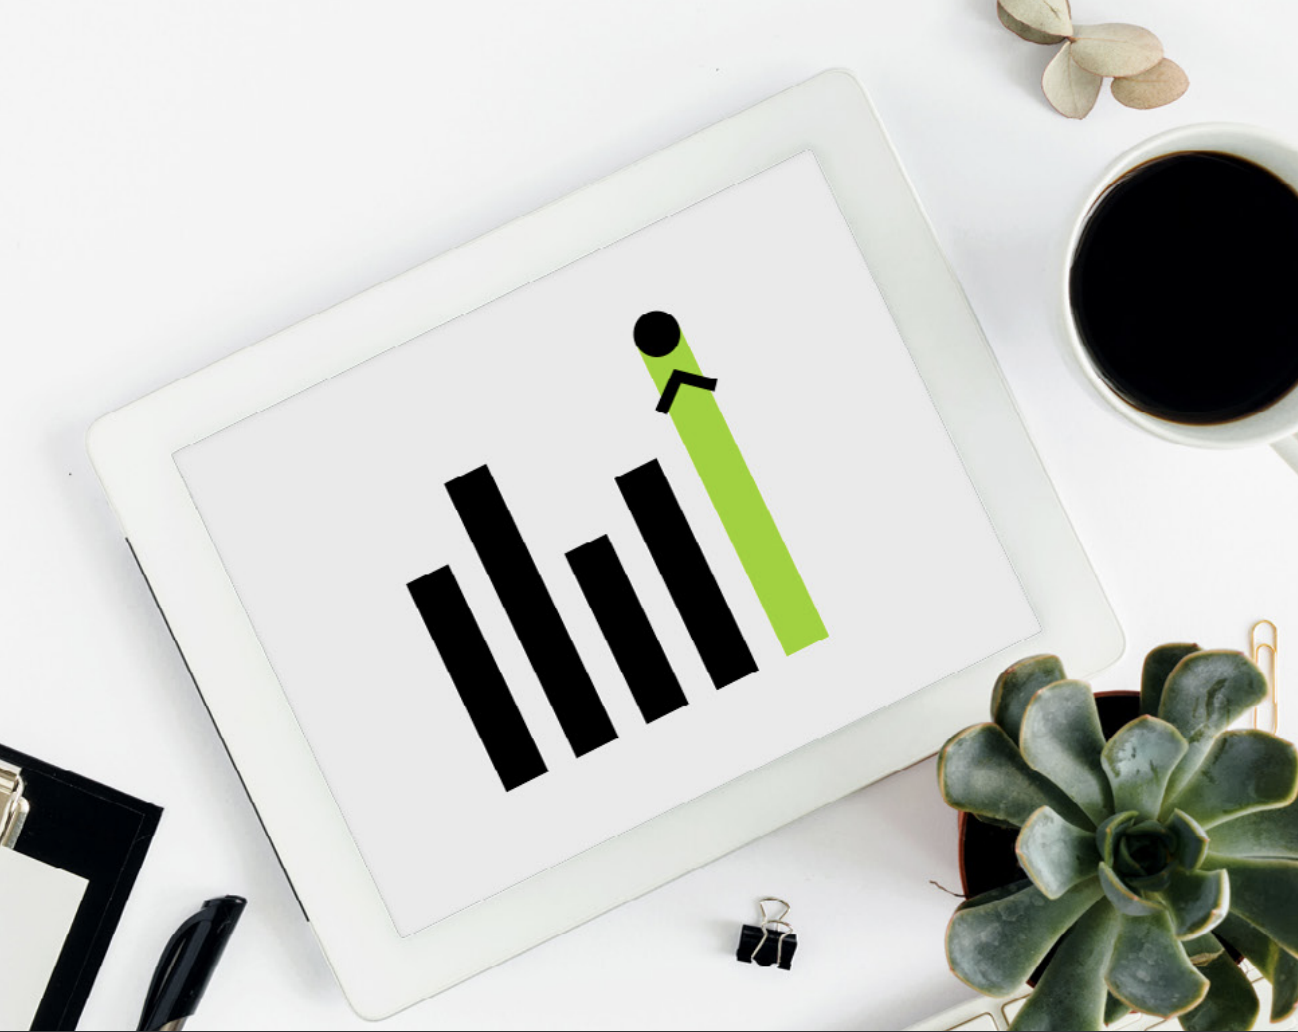 Image of hiring success graphs